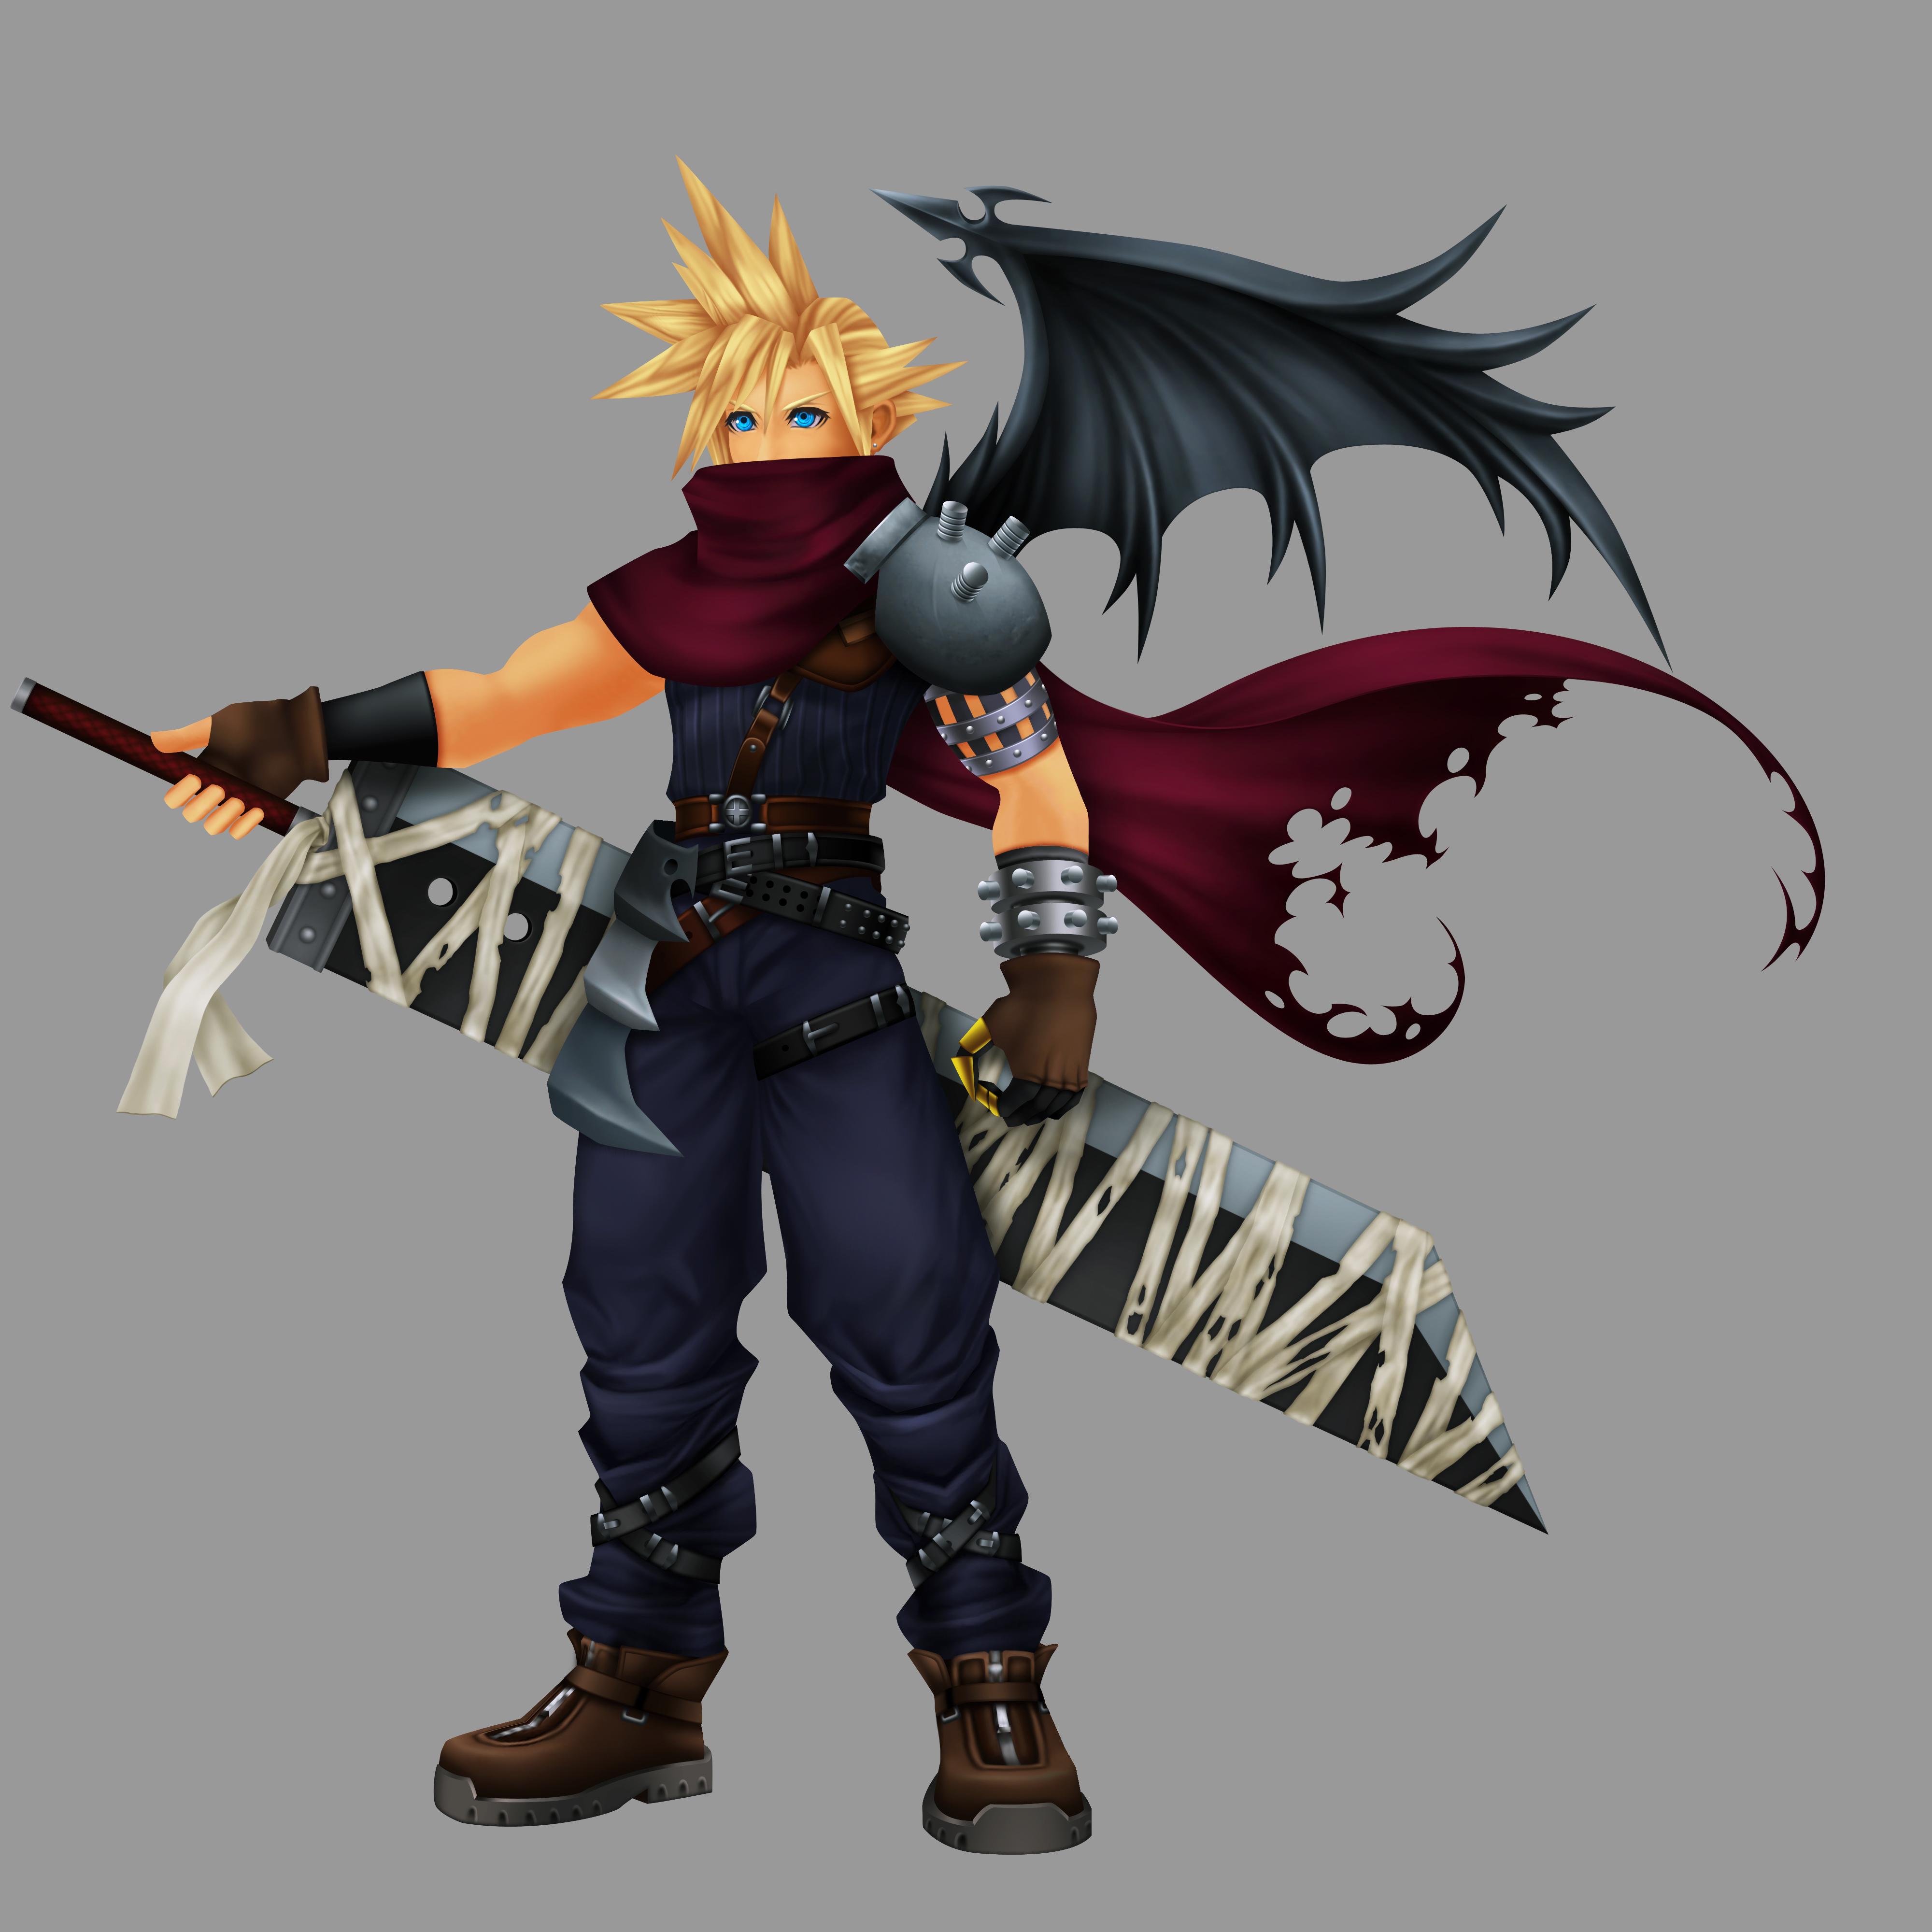 Cloud Strife Final Fantasy Vii Image 2400764 Zerochan